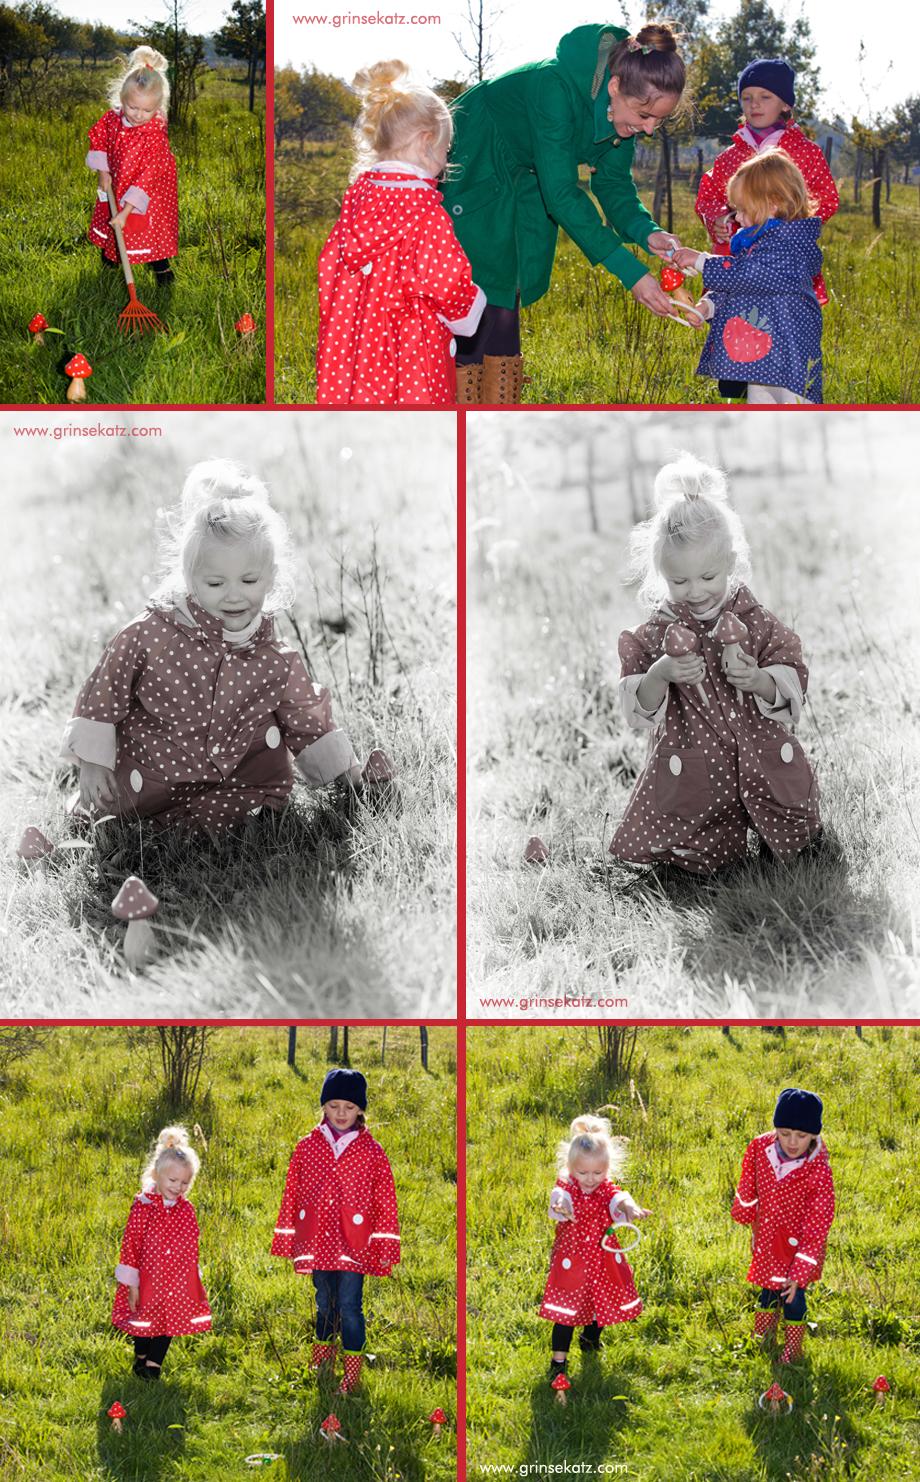 styled-shoot-outdoor-kinderfotos-templin